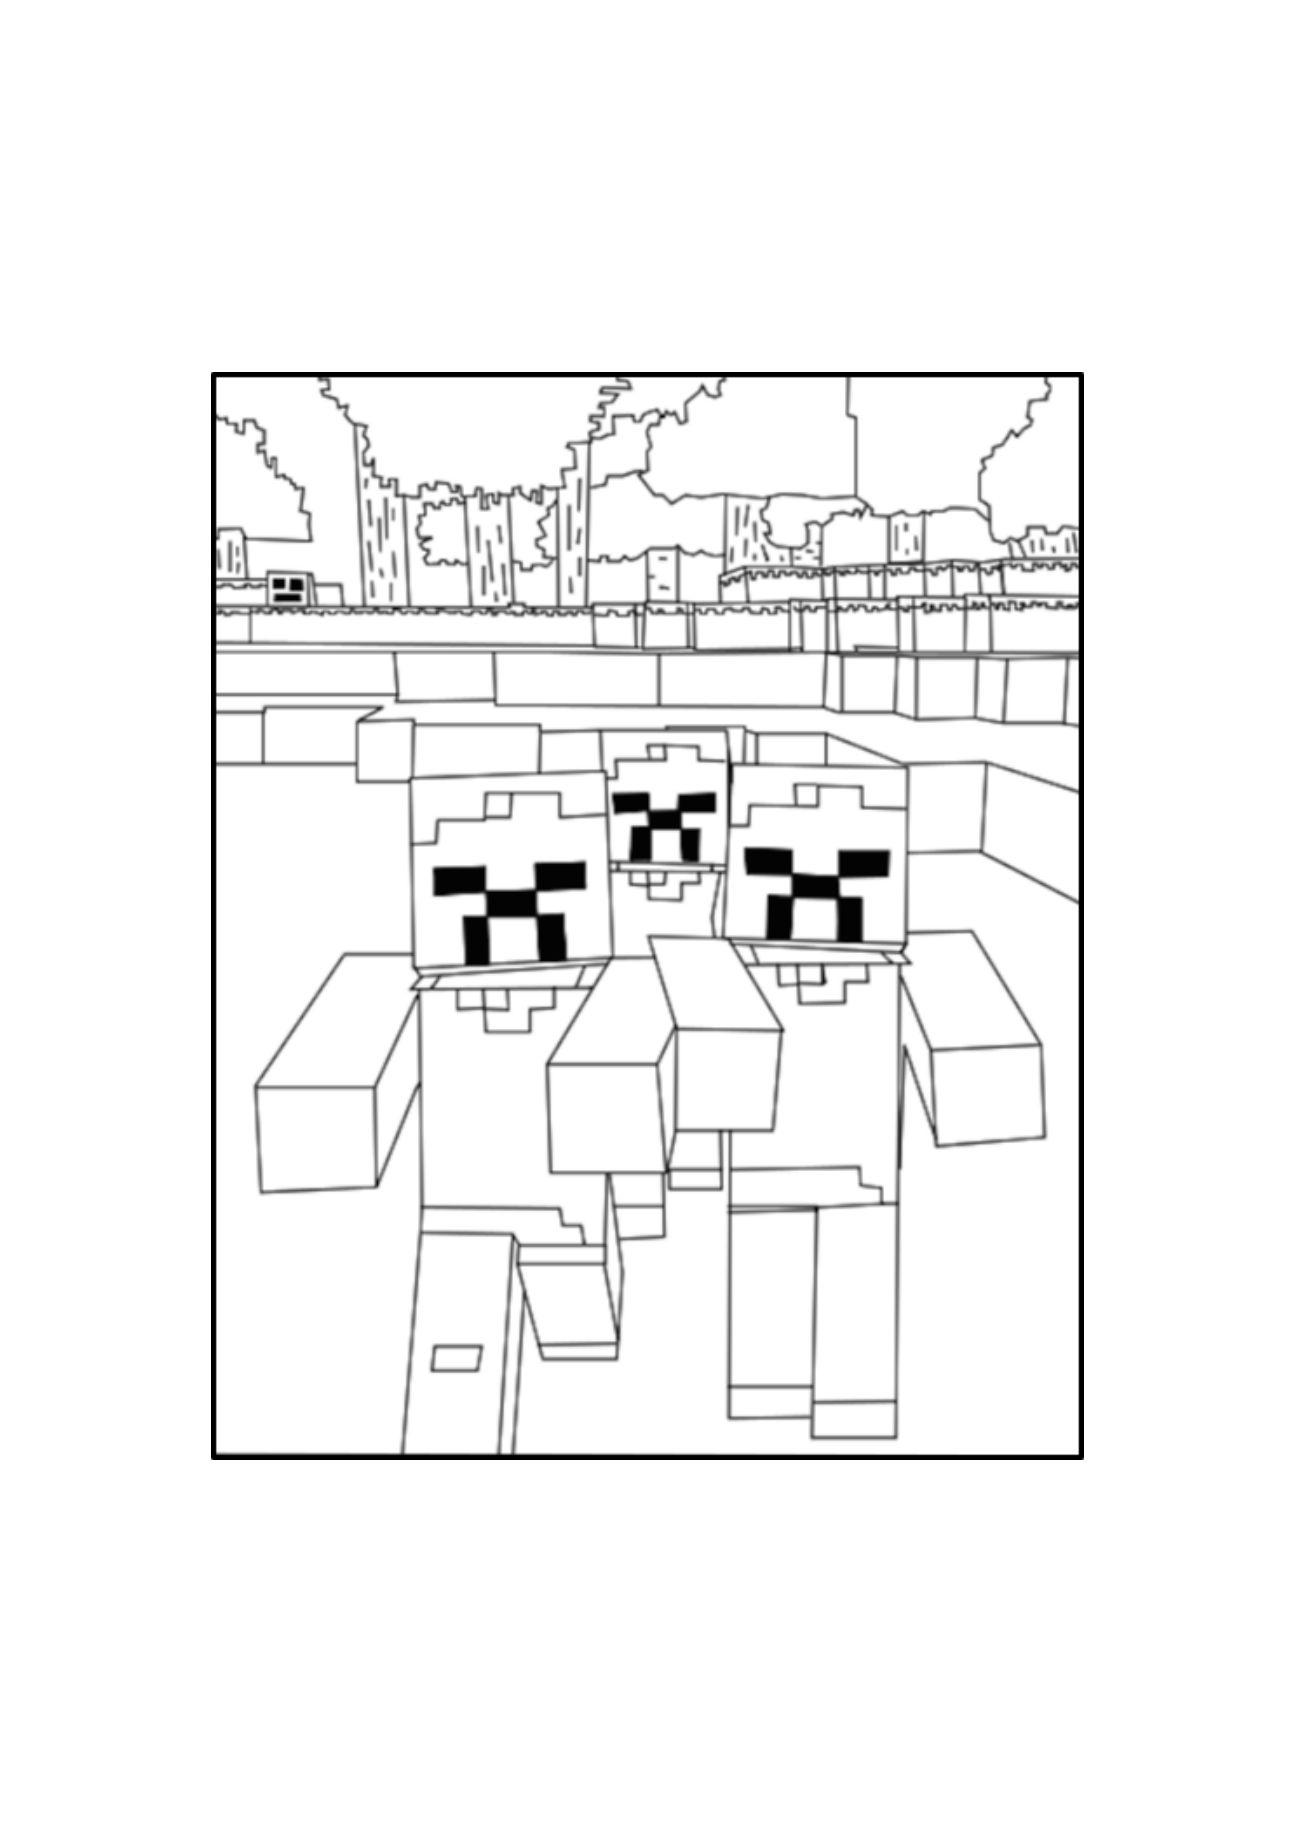 Minecraft Coloring Pages Minecraft Coloring Pages Coloring Pages Coloring For Kids